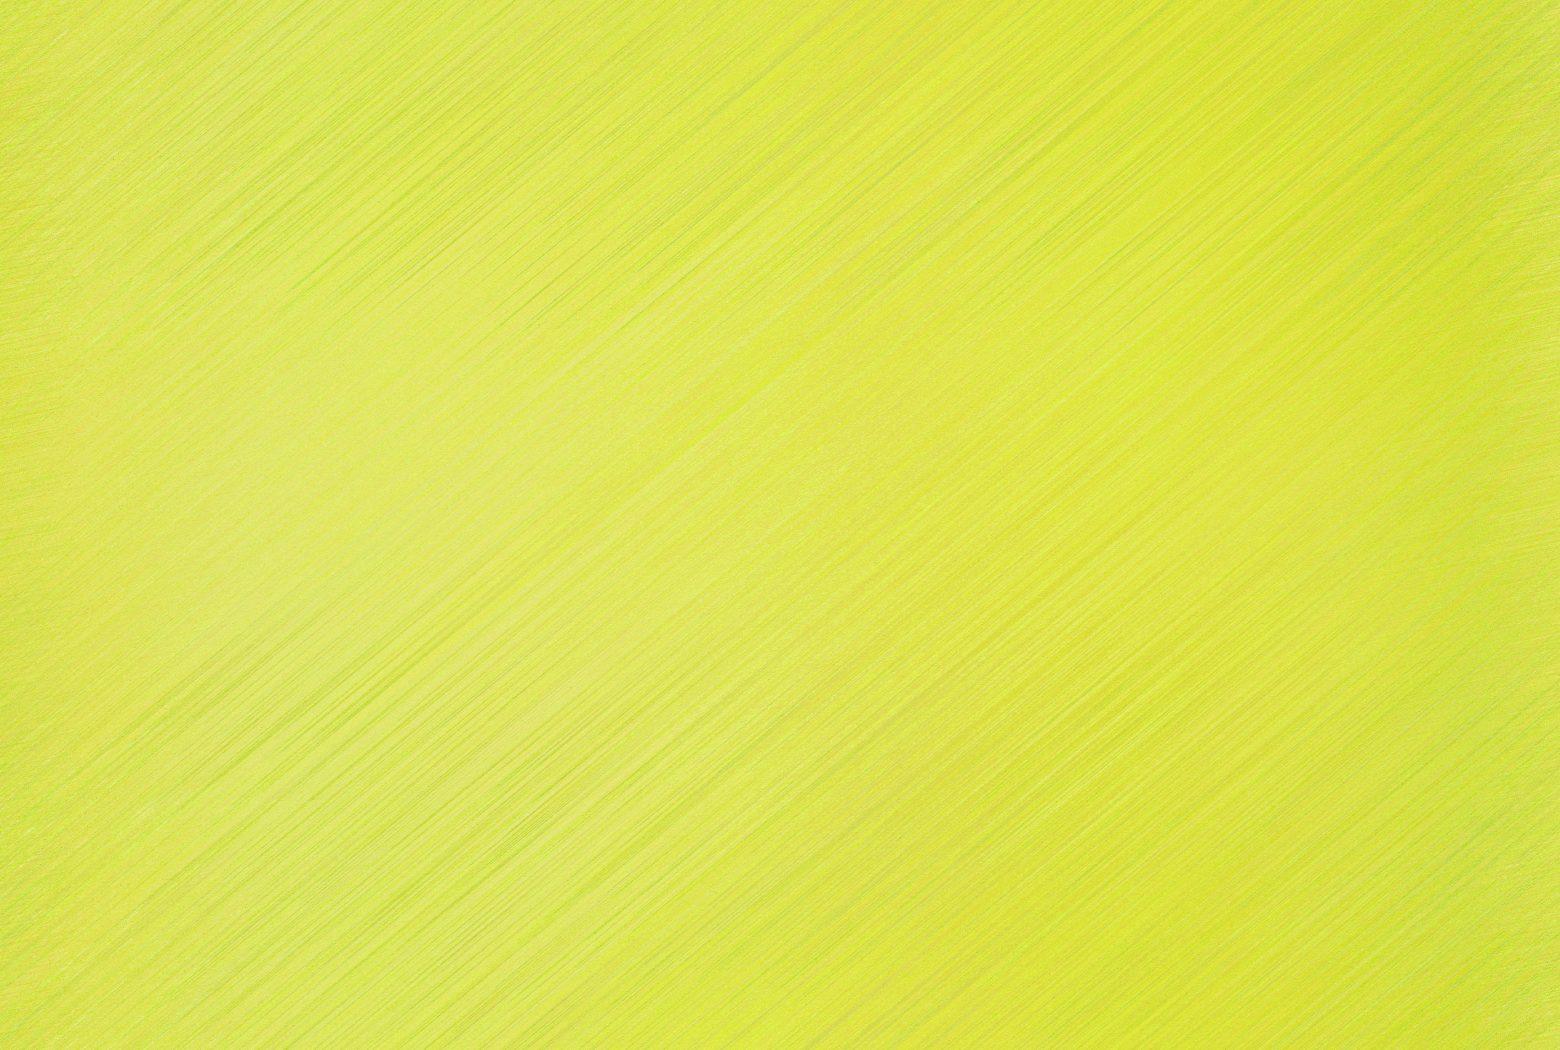 background-texture-2110720